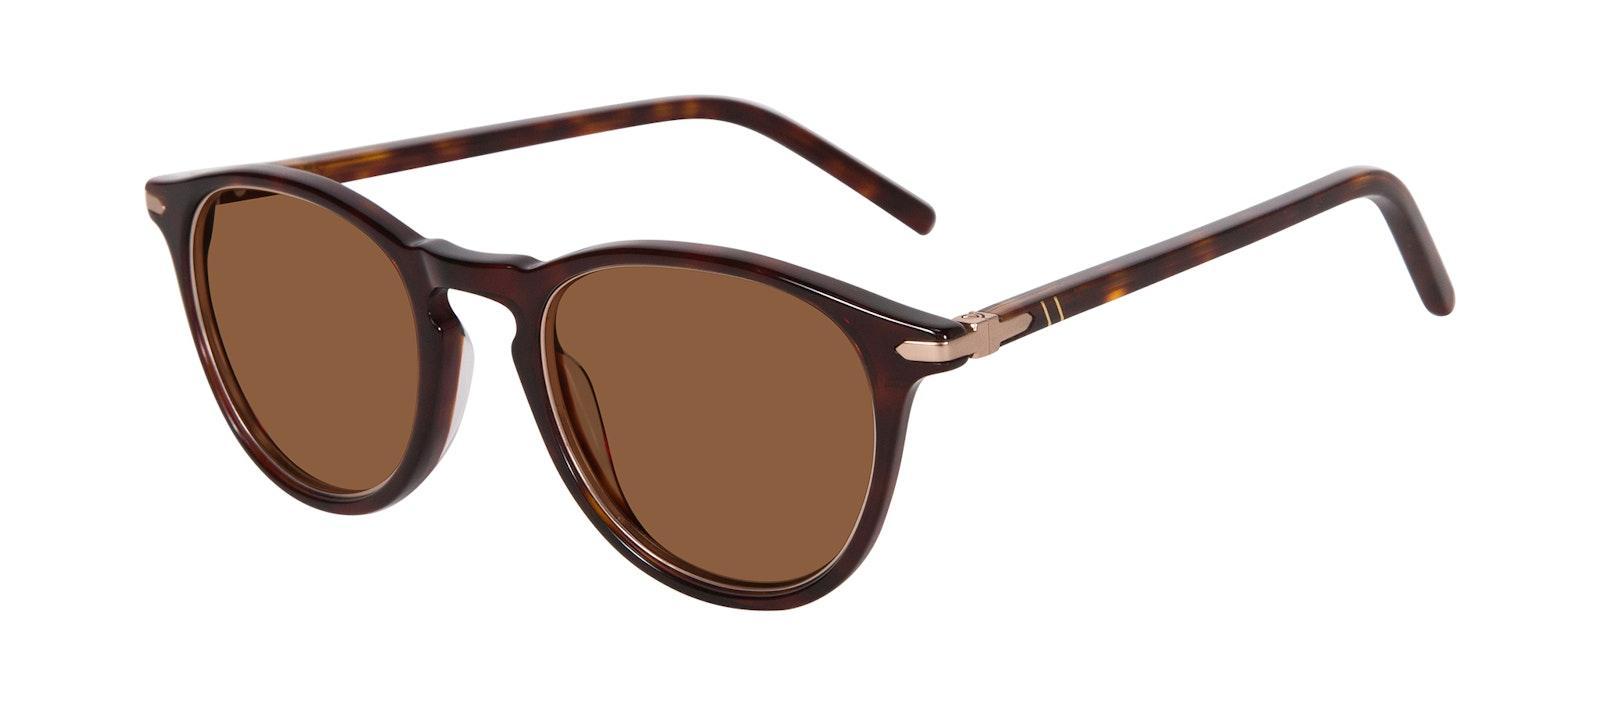 Affordable Fashion Glasses Round Sunglasses Men Looks Tortoise Tilt